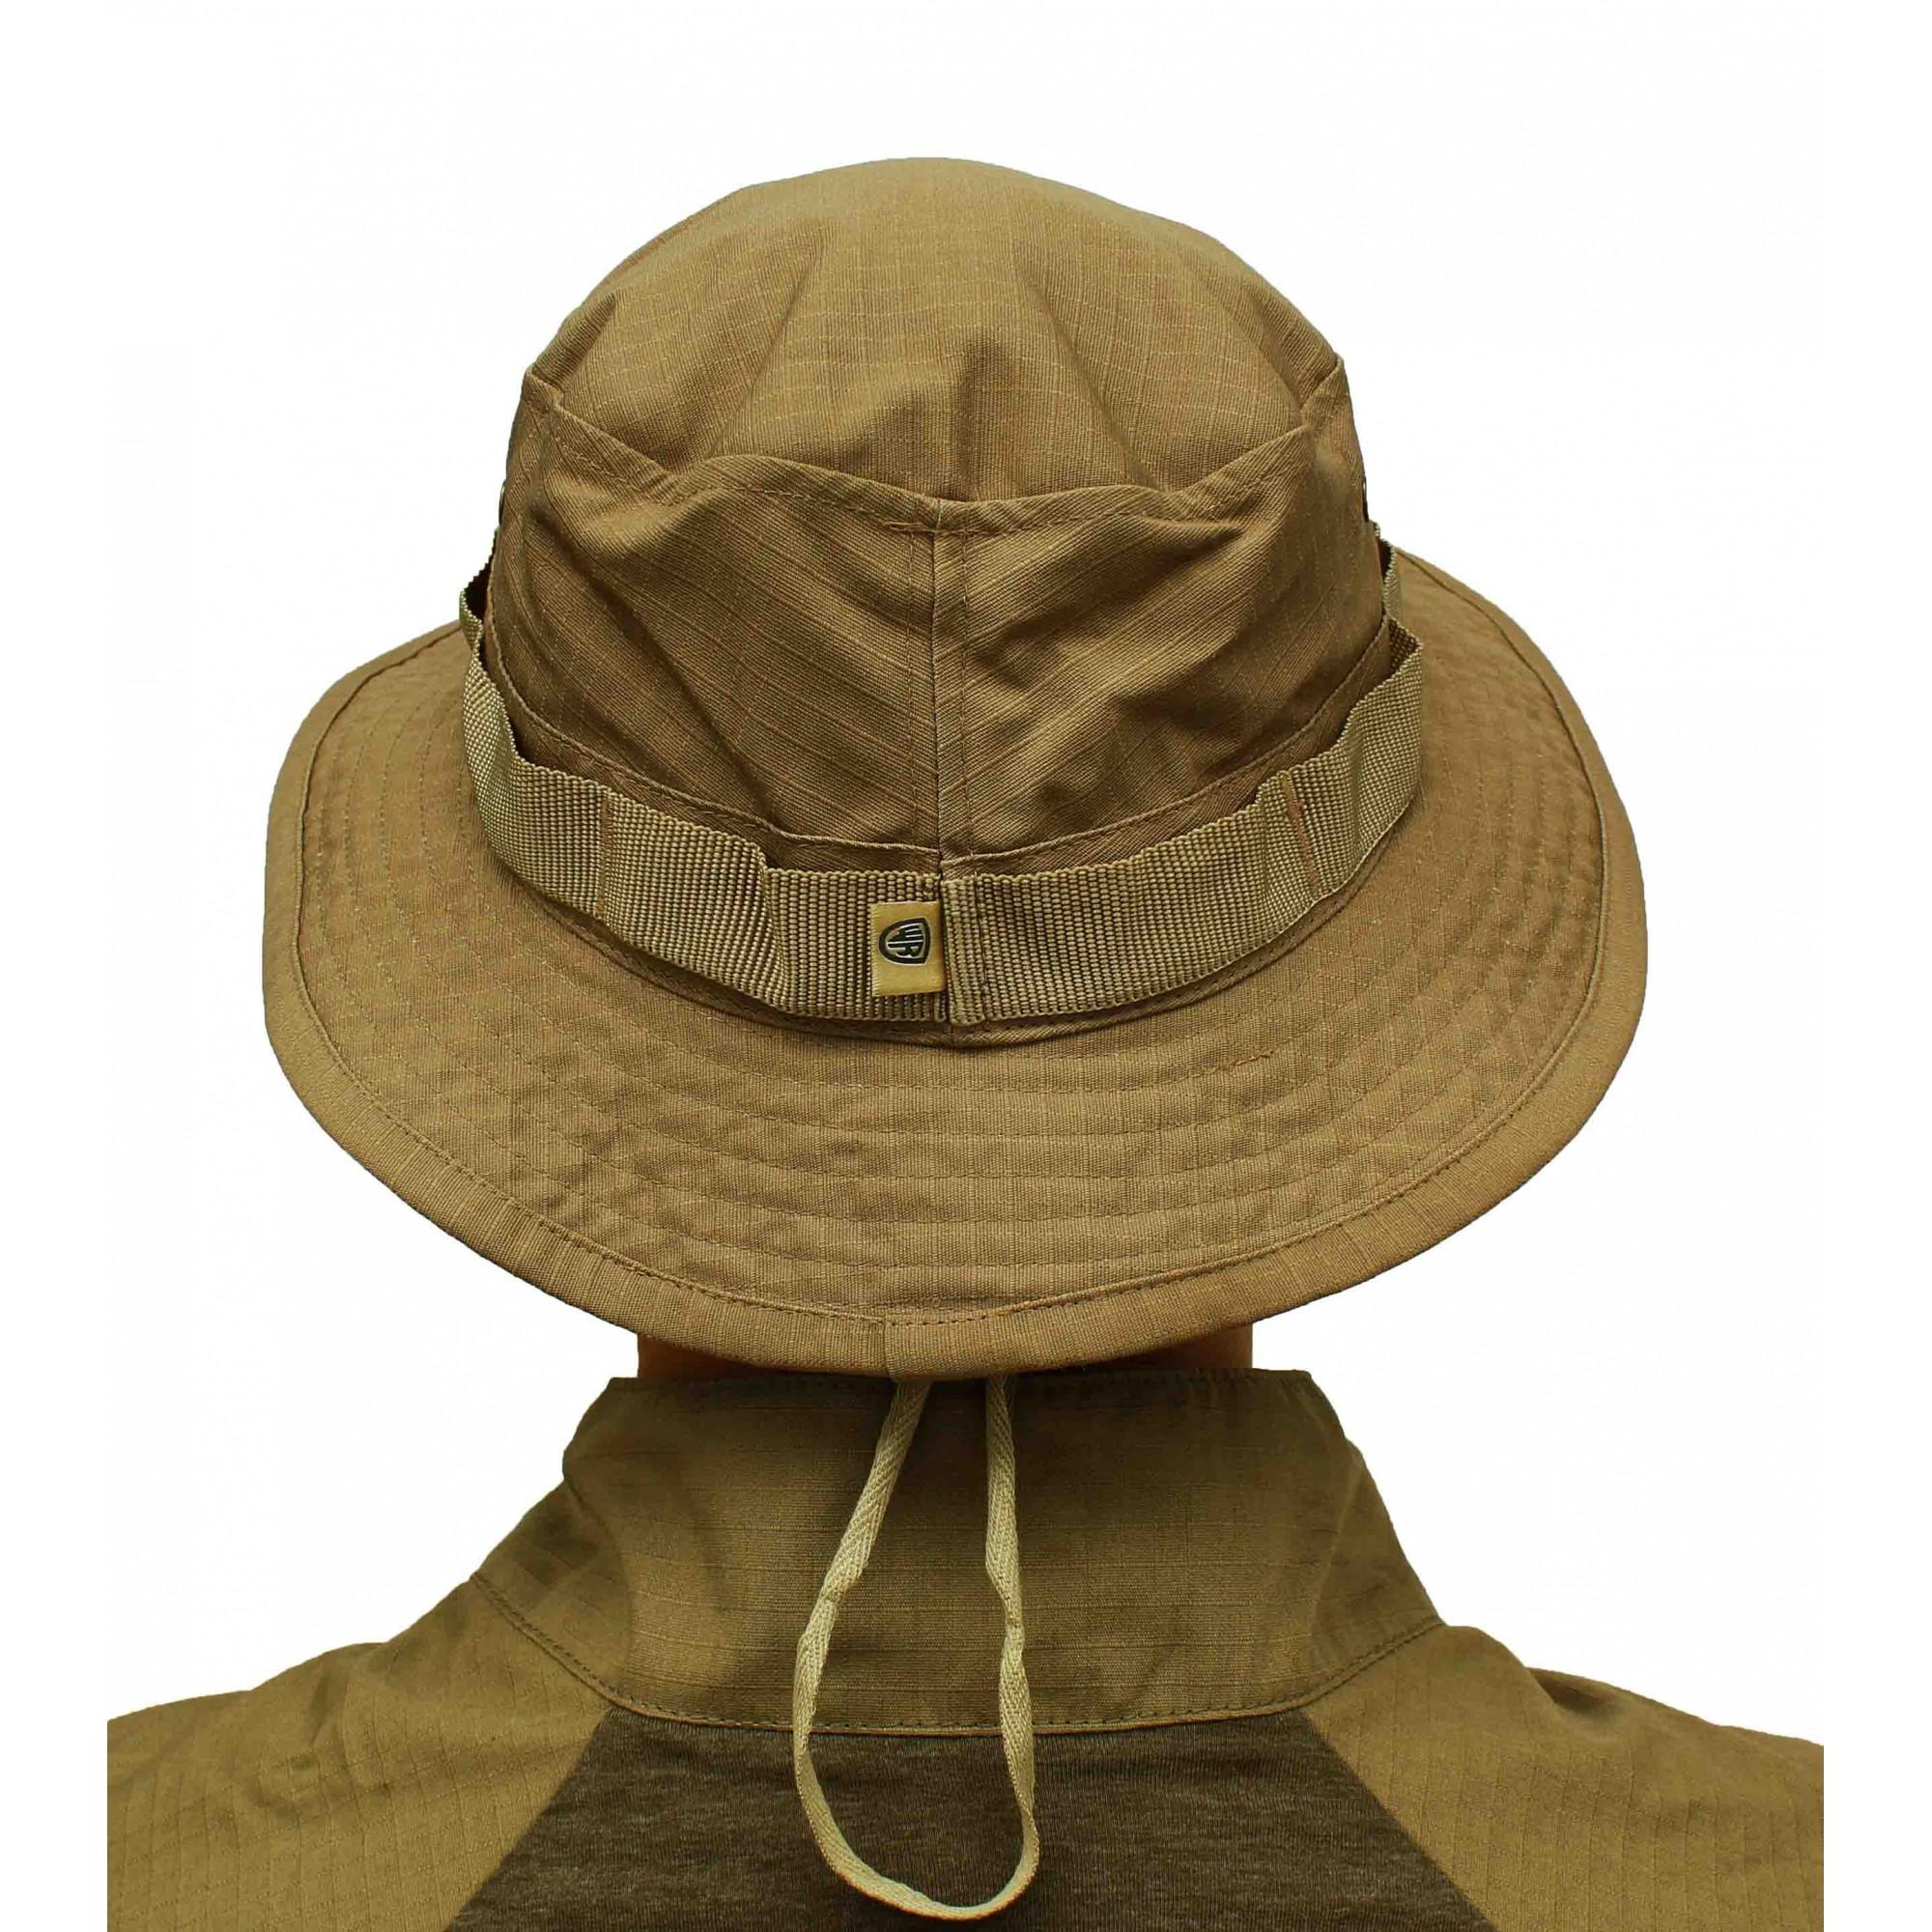 Bonnie Hat - Tan